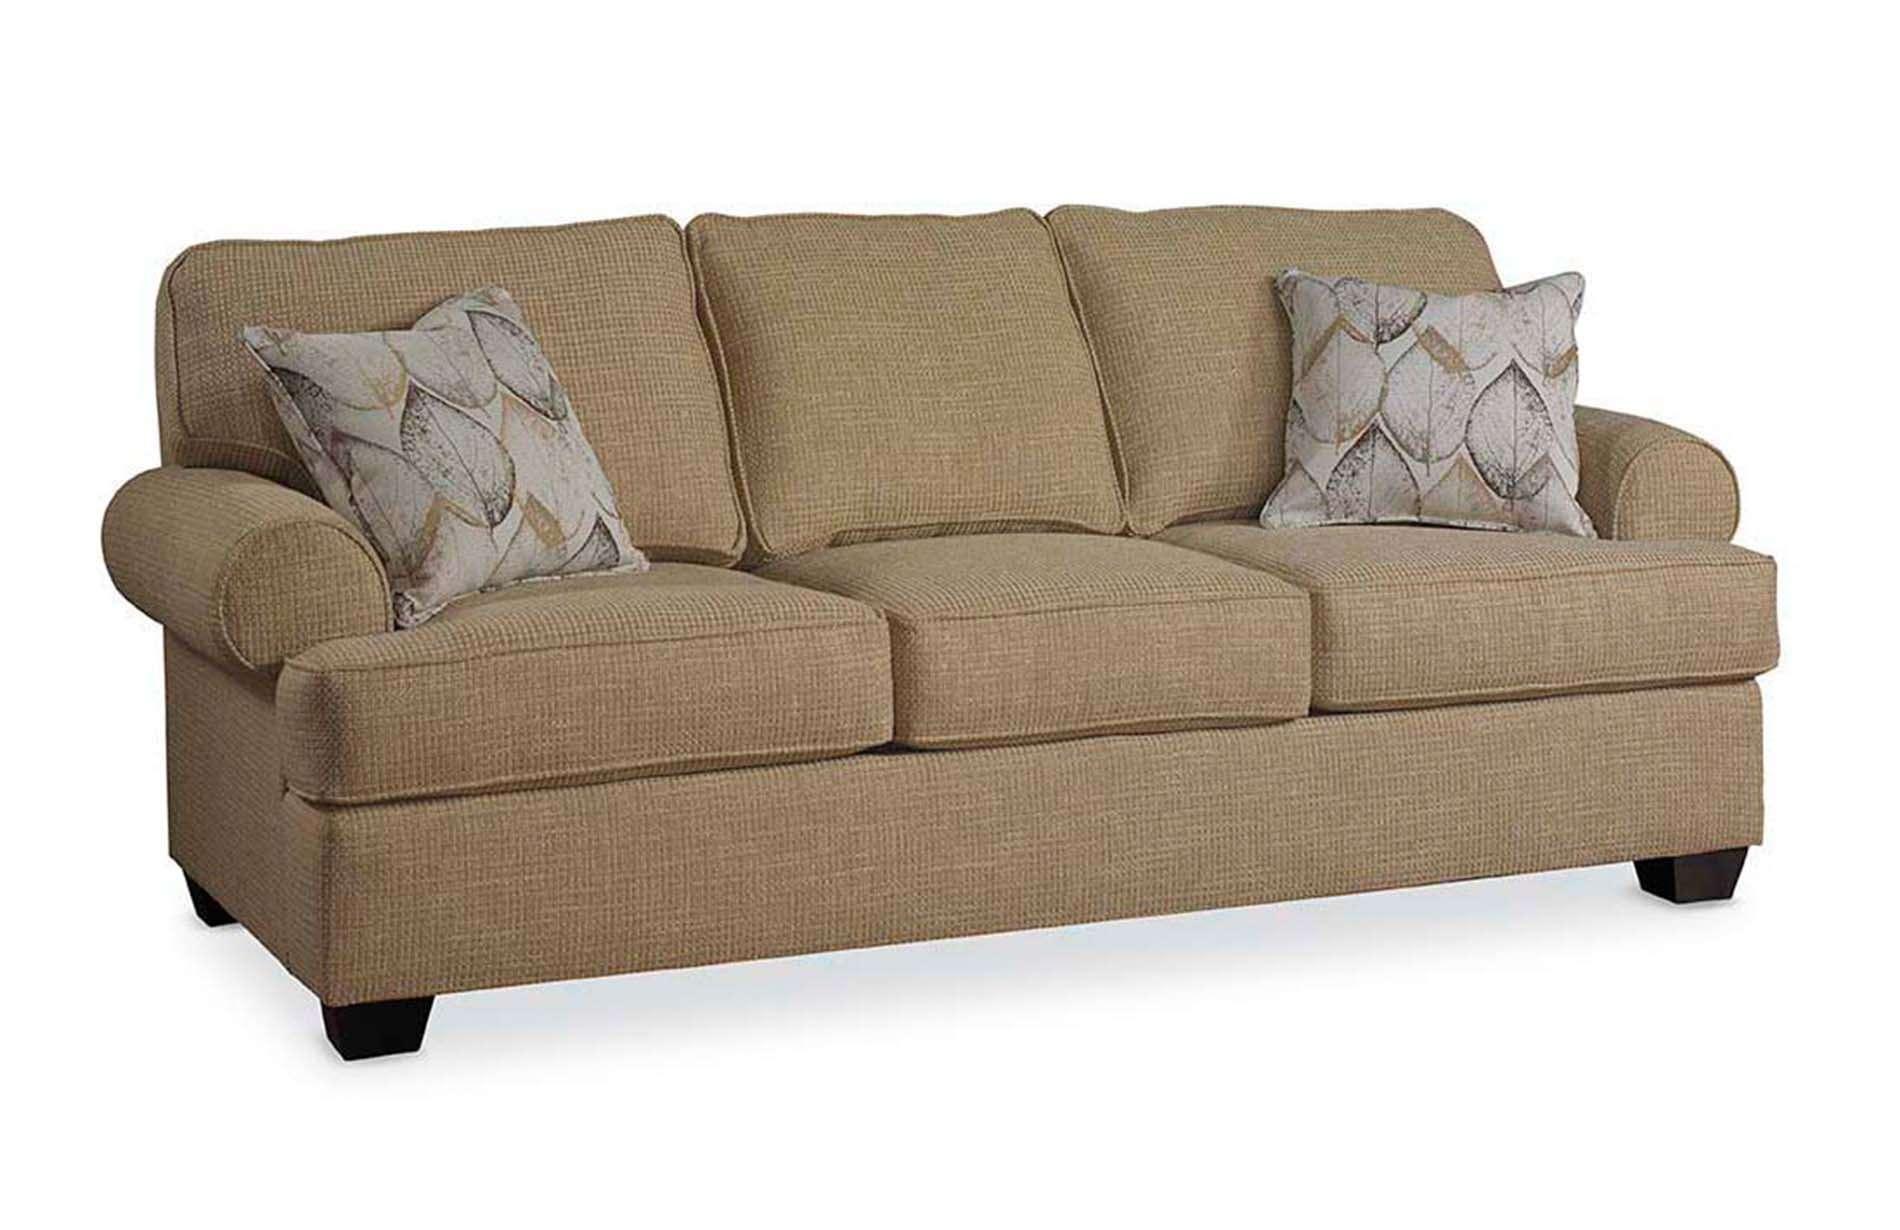 Sleeper Sofa One Pointedness Sleeper Sofa Beds On Sale